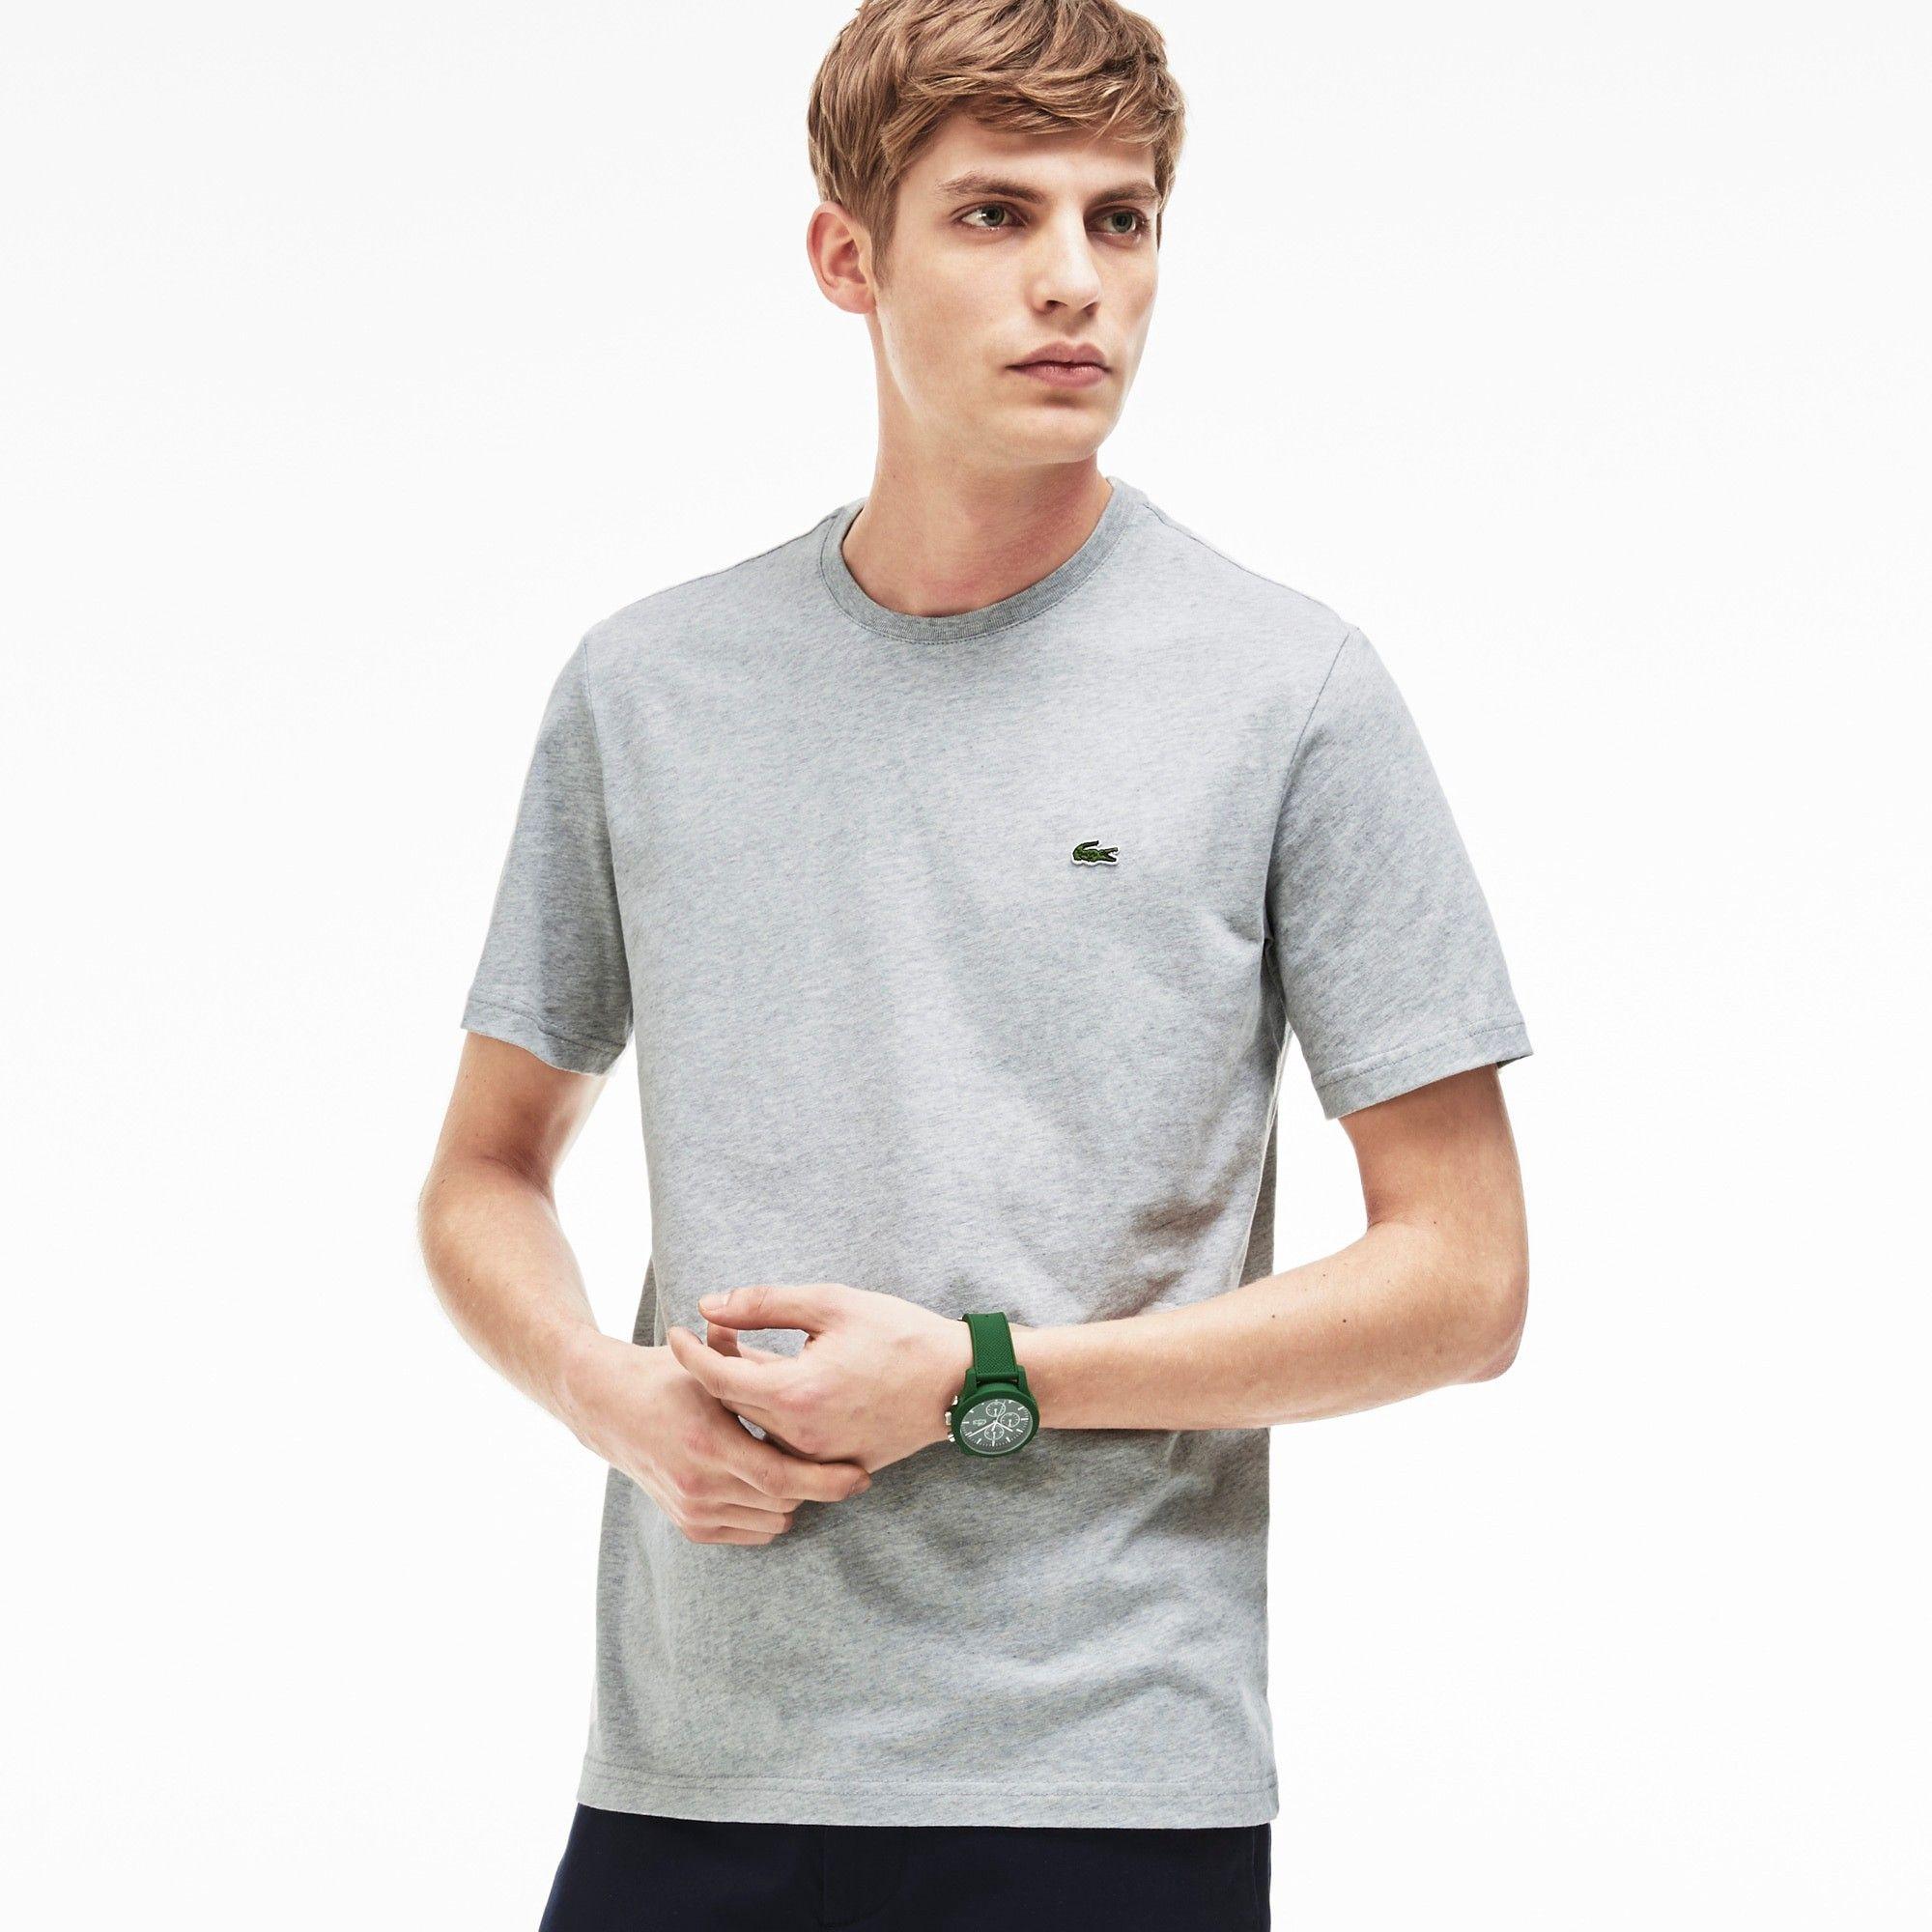 3eabe50c9d6 LACOSTE Men s Logo T-Shirt - silver grey chine.  lacoste  cloth ...